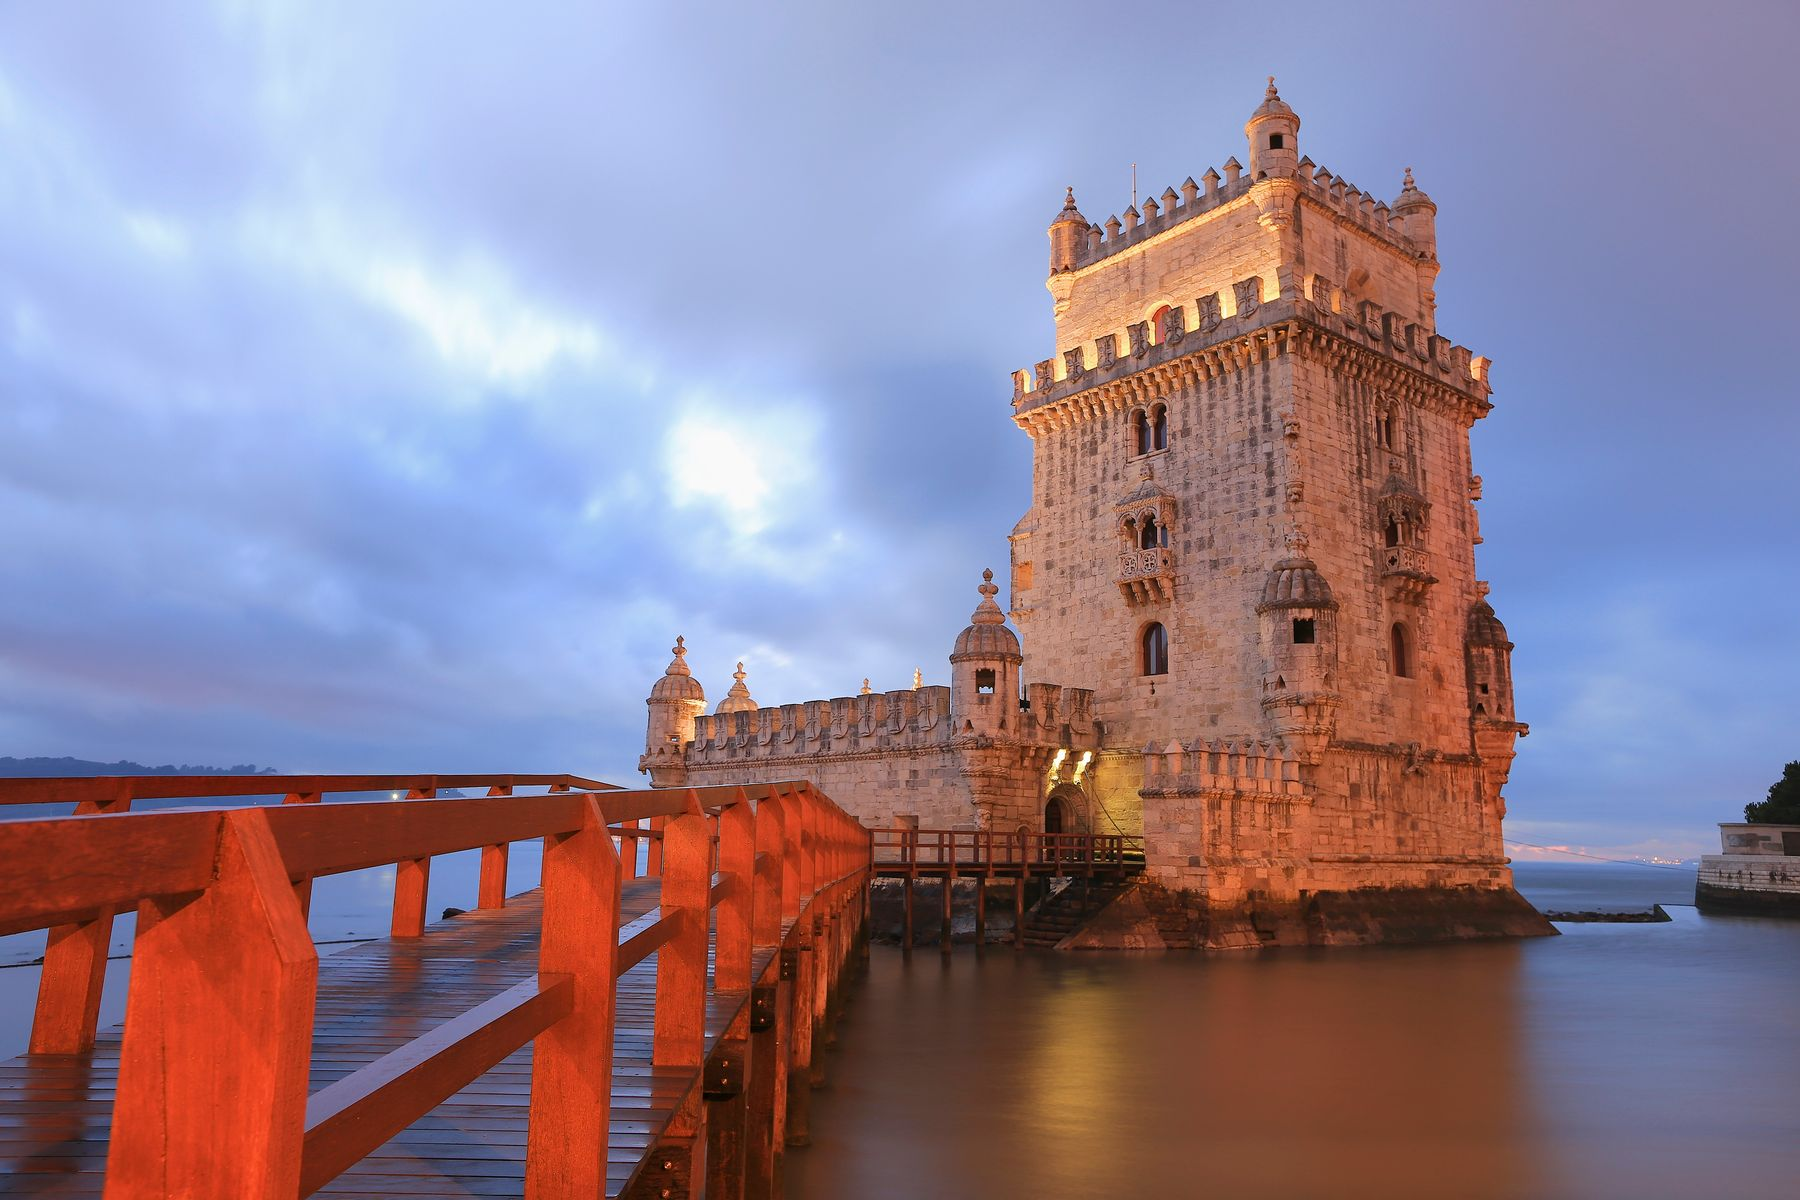 Torre de Belém, em Lisboa, Portugal.